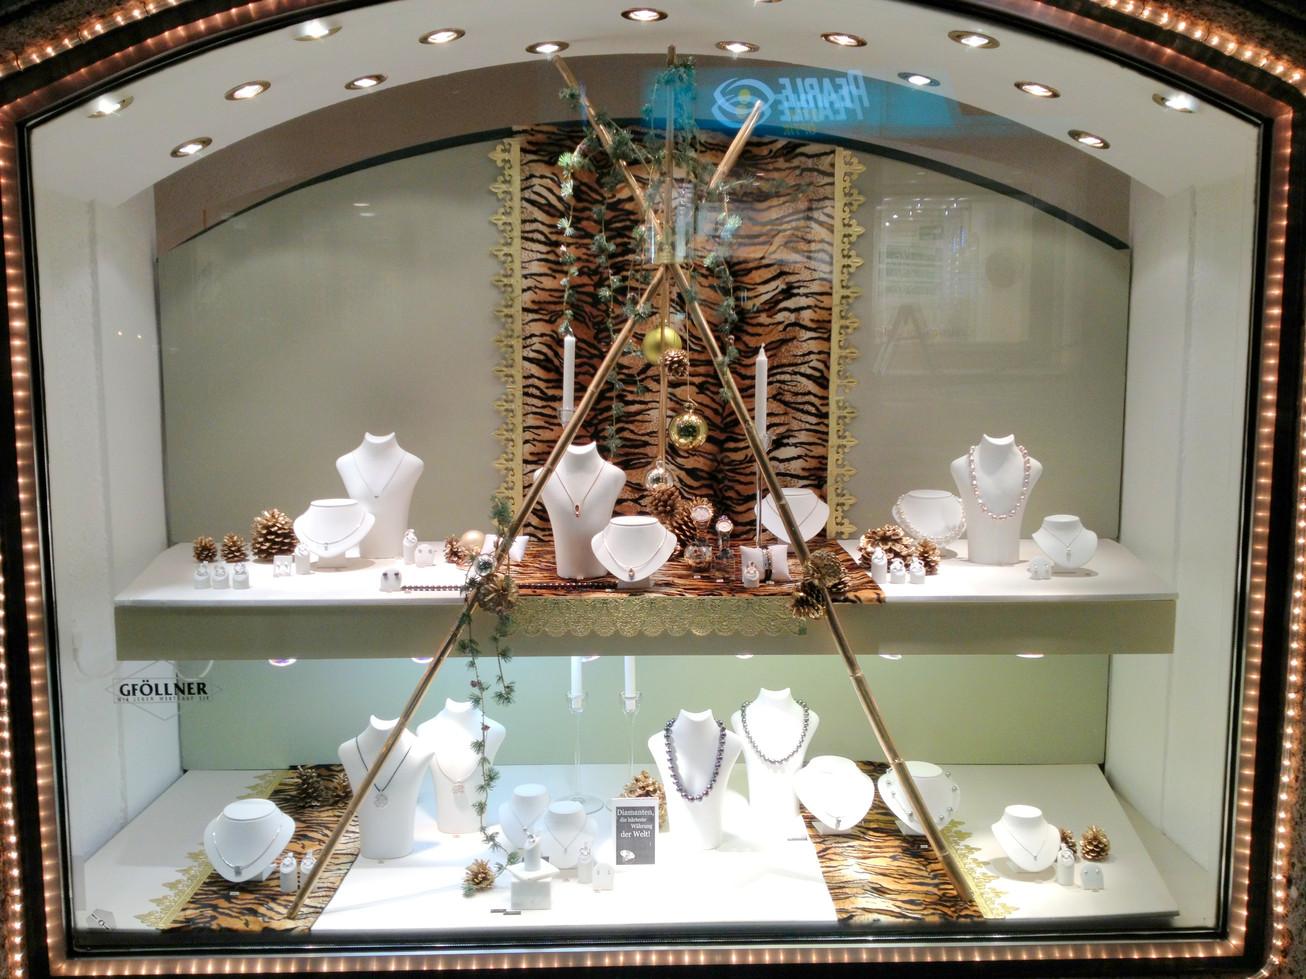 Weihnachten  Juwelier  Isolde Skrabitz